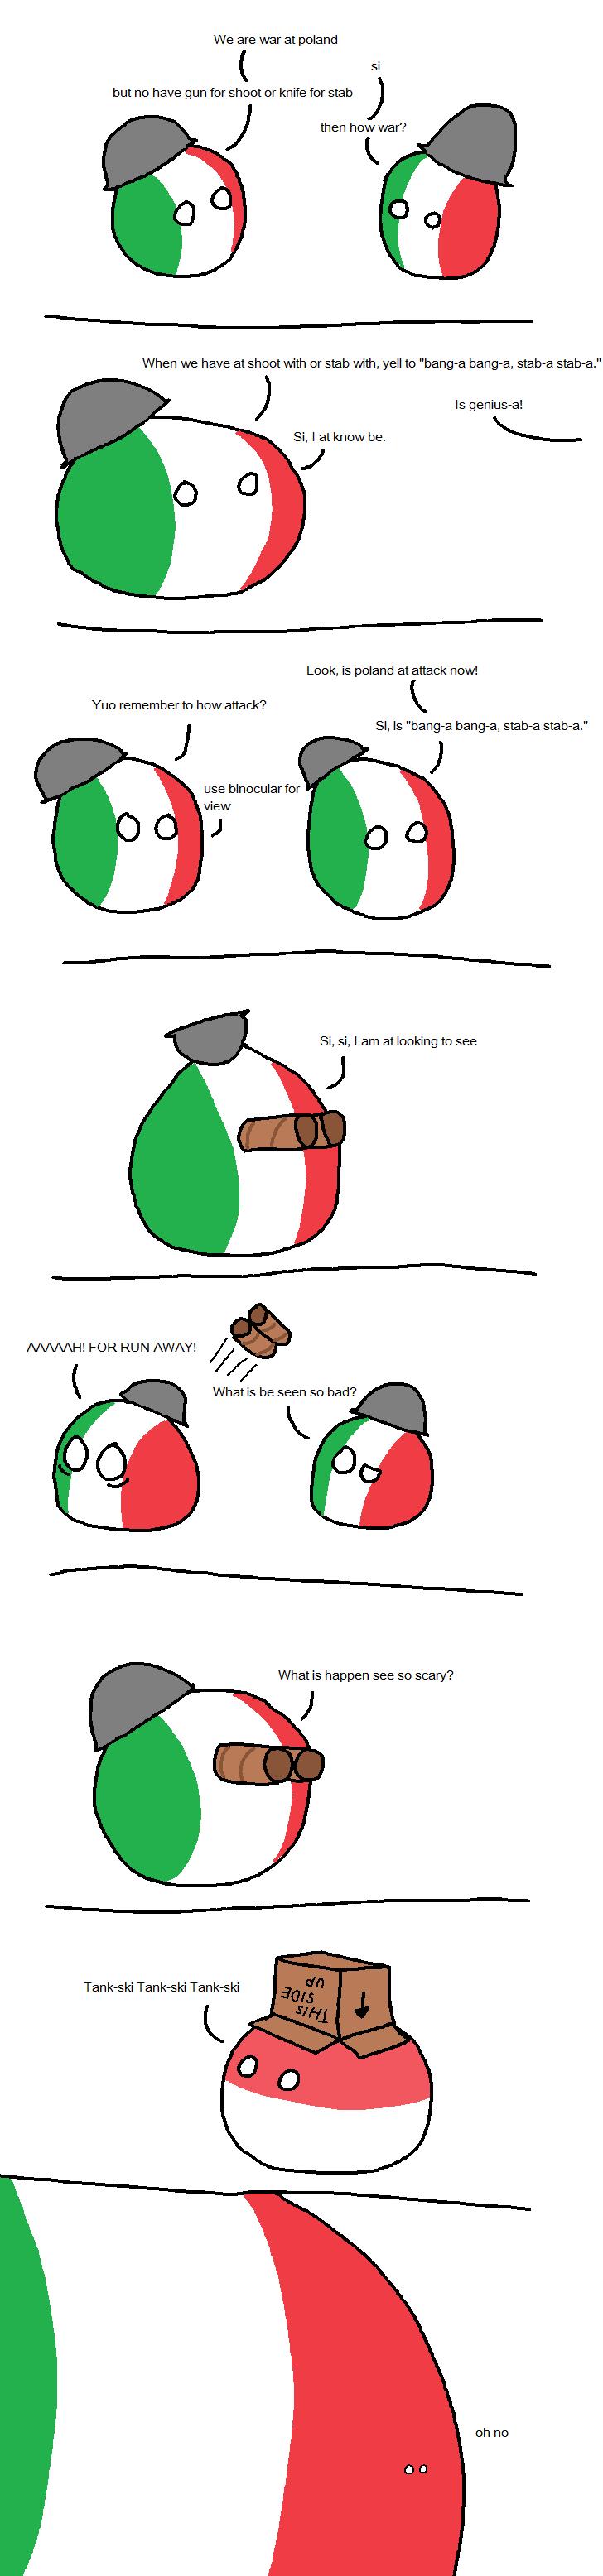 Italy's Day